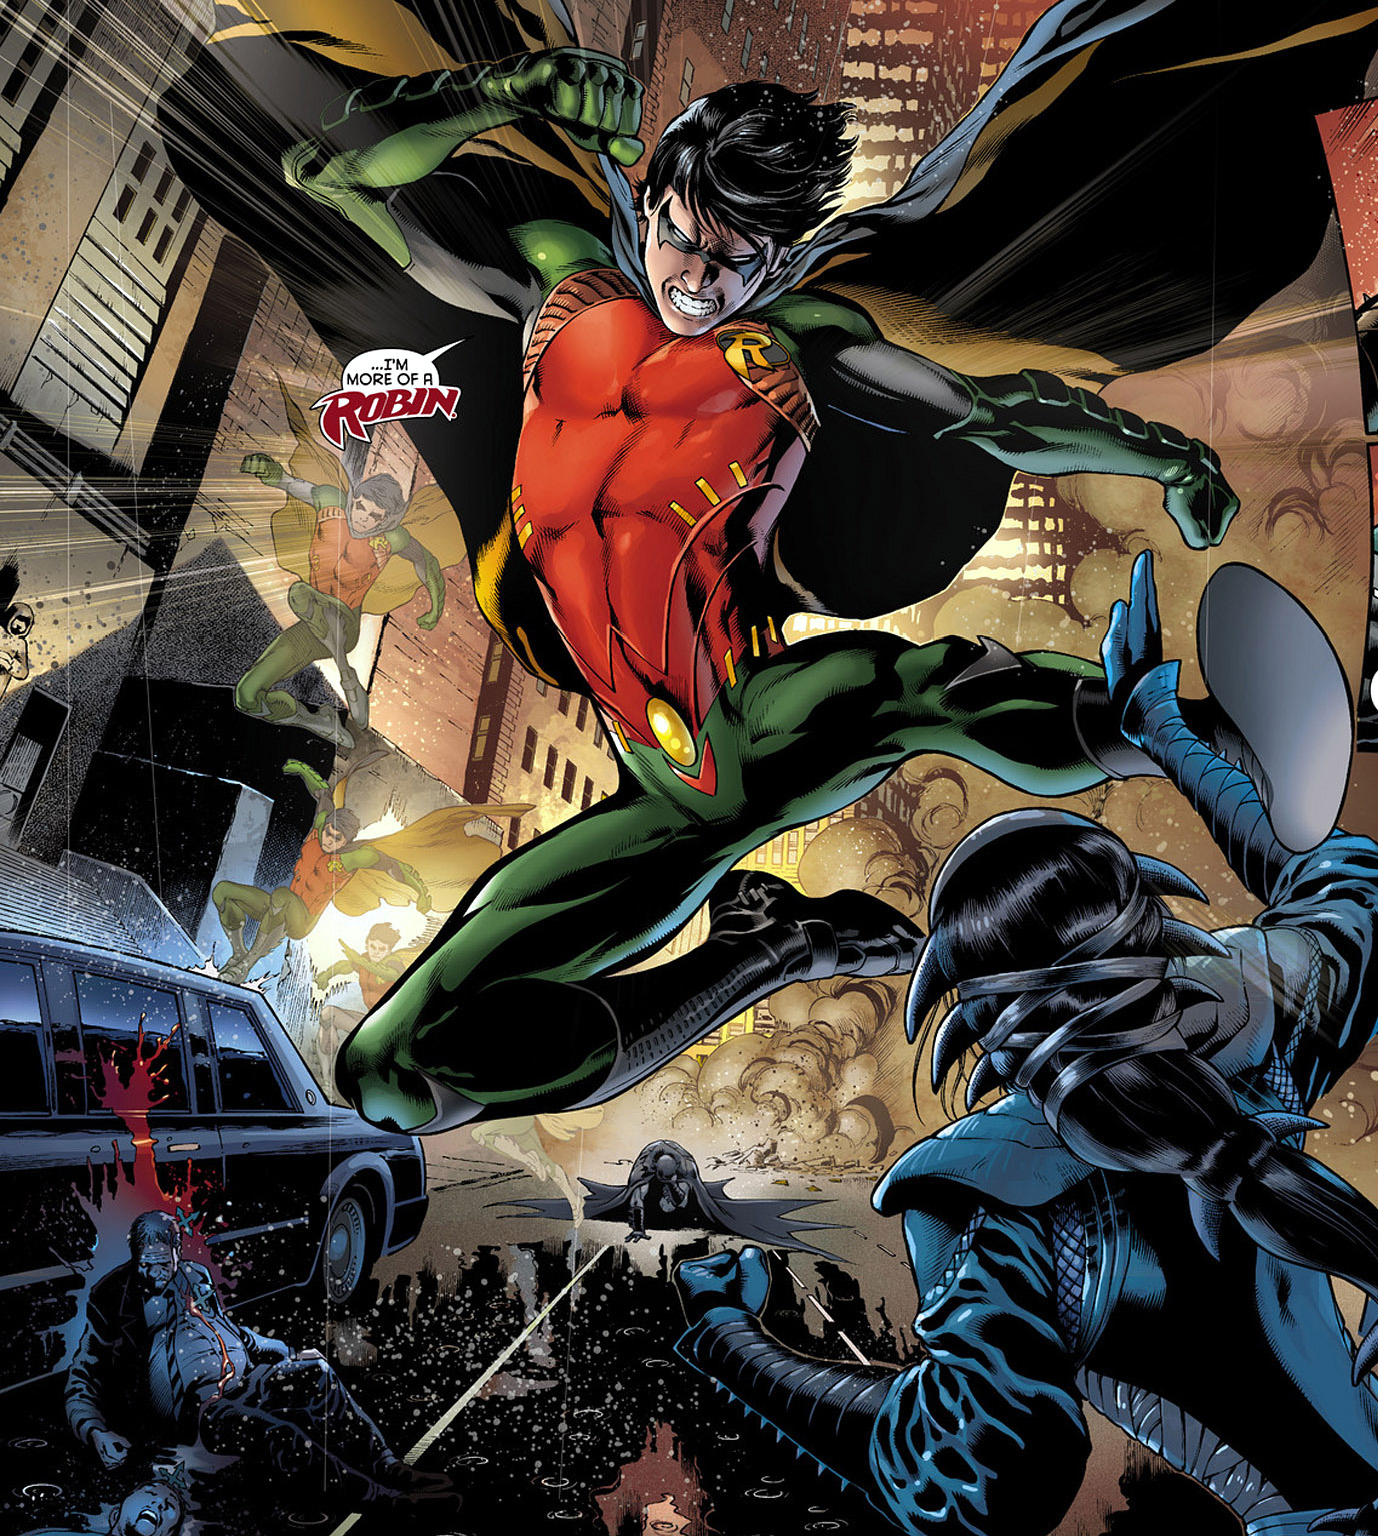 Dick Grayson S New 52 Robin Costume Comicnewbies